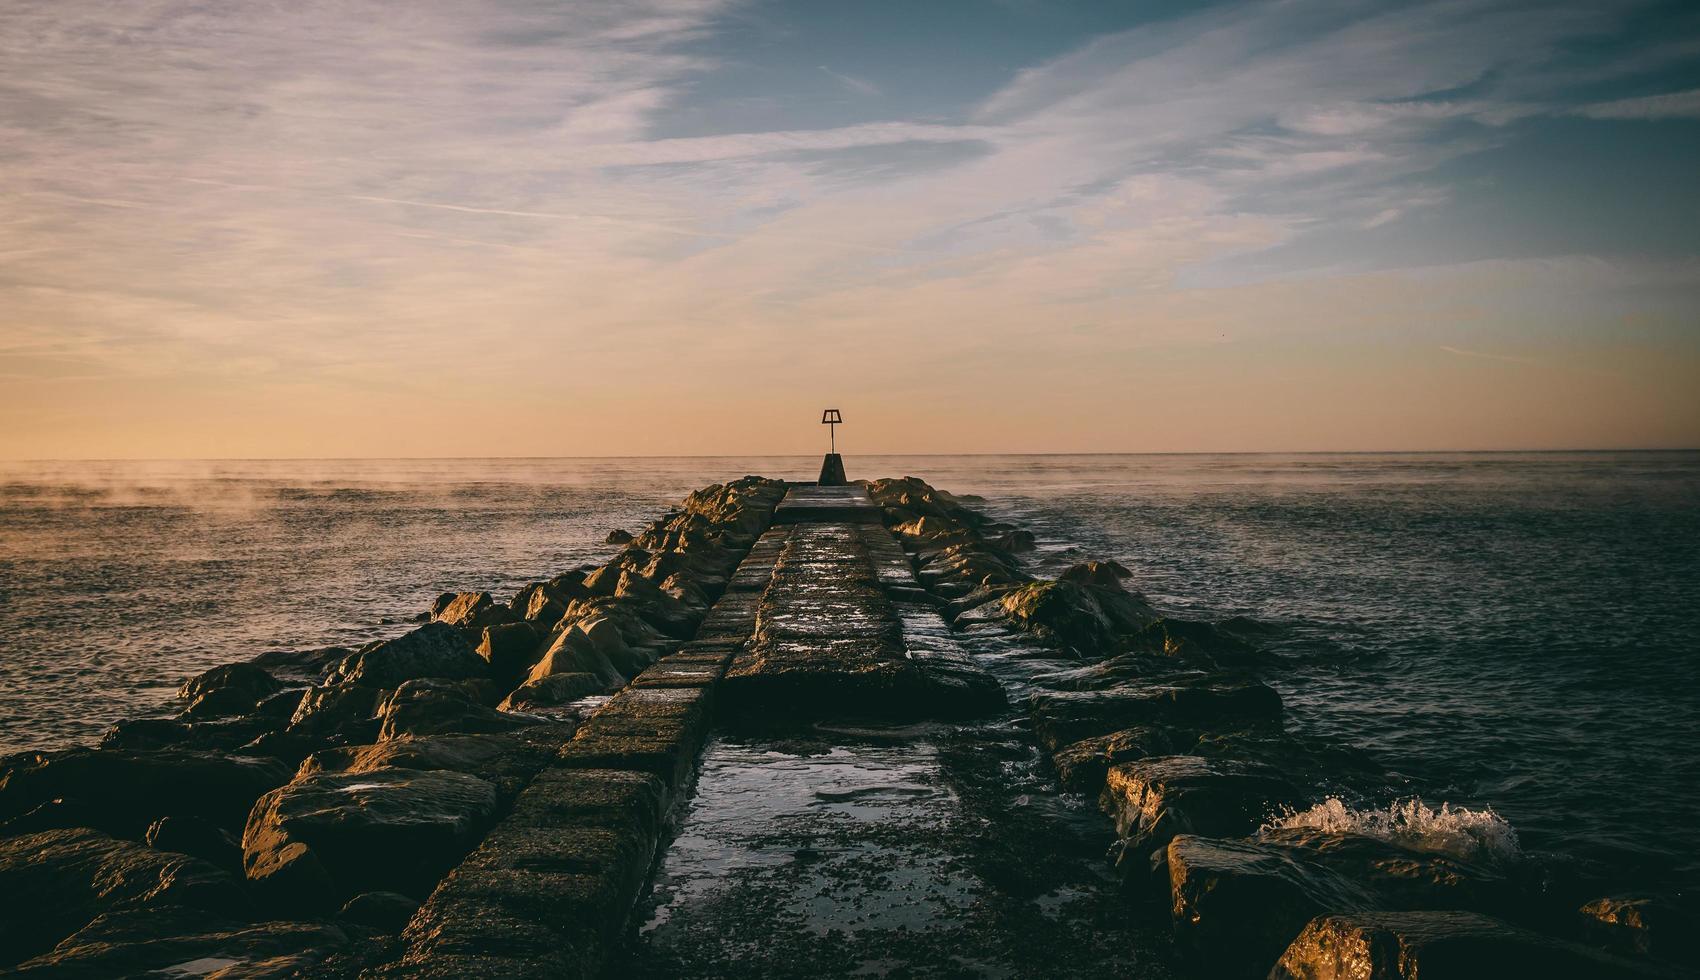 Ozeansteg im Morgengrauen foto